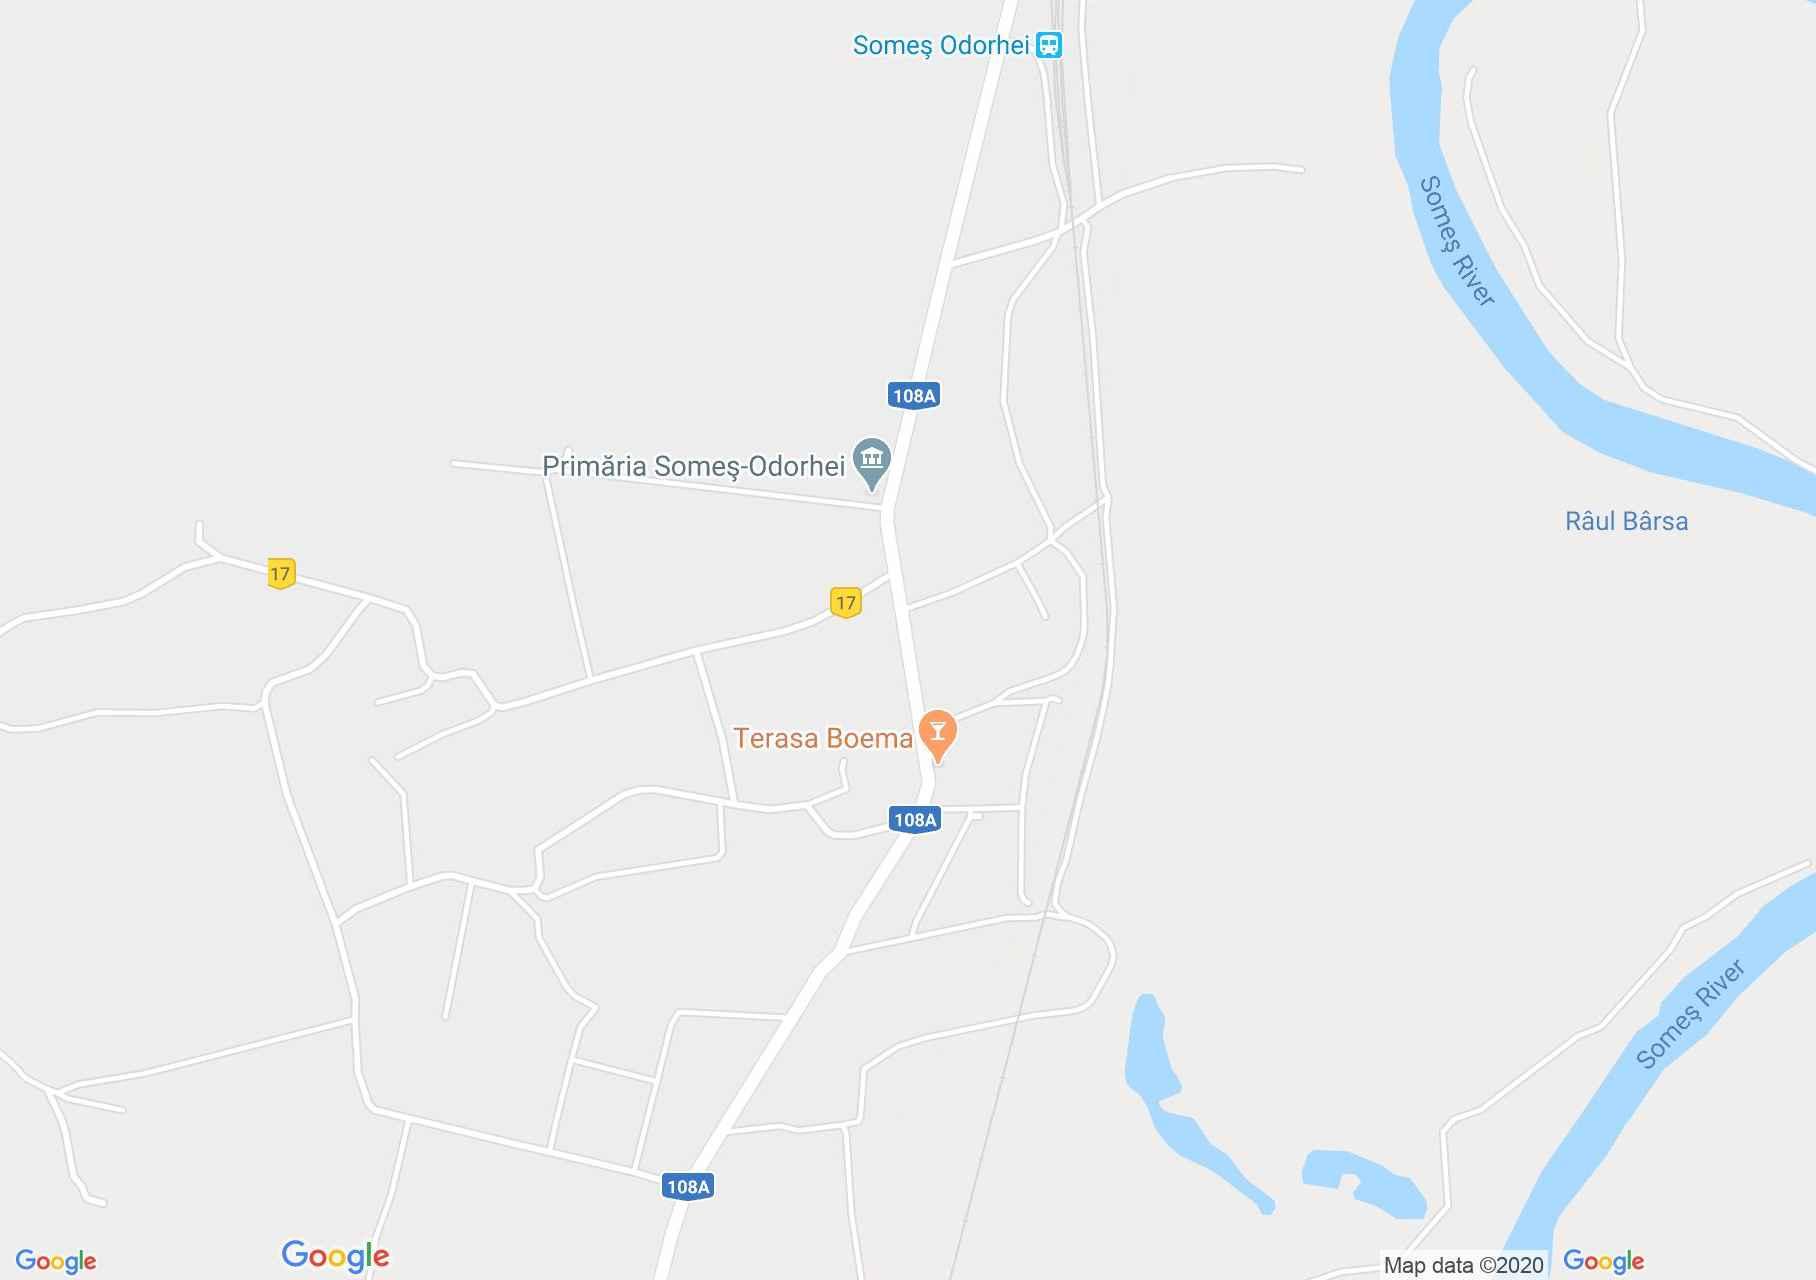 Someş Odorhei, Interactive tourist map